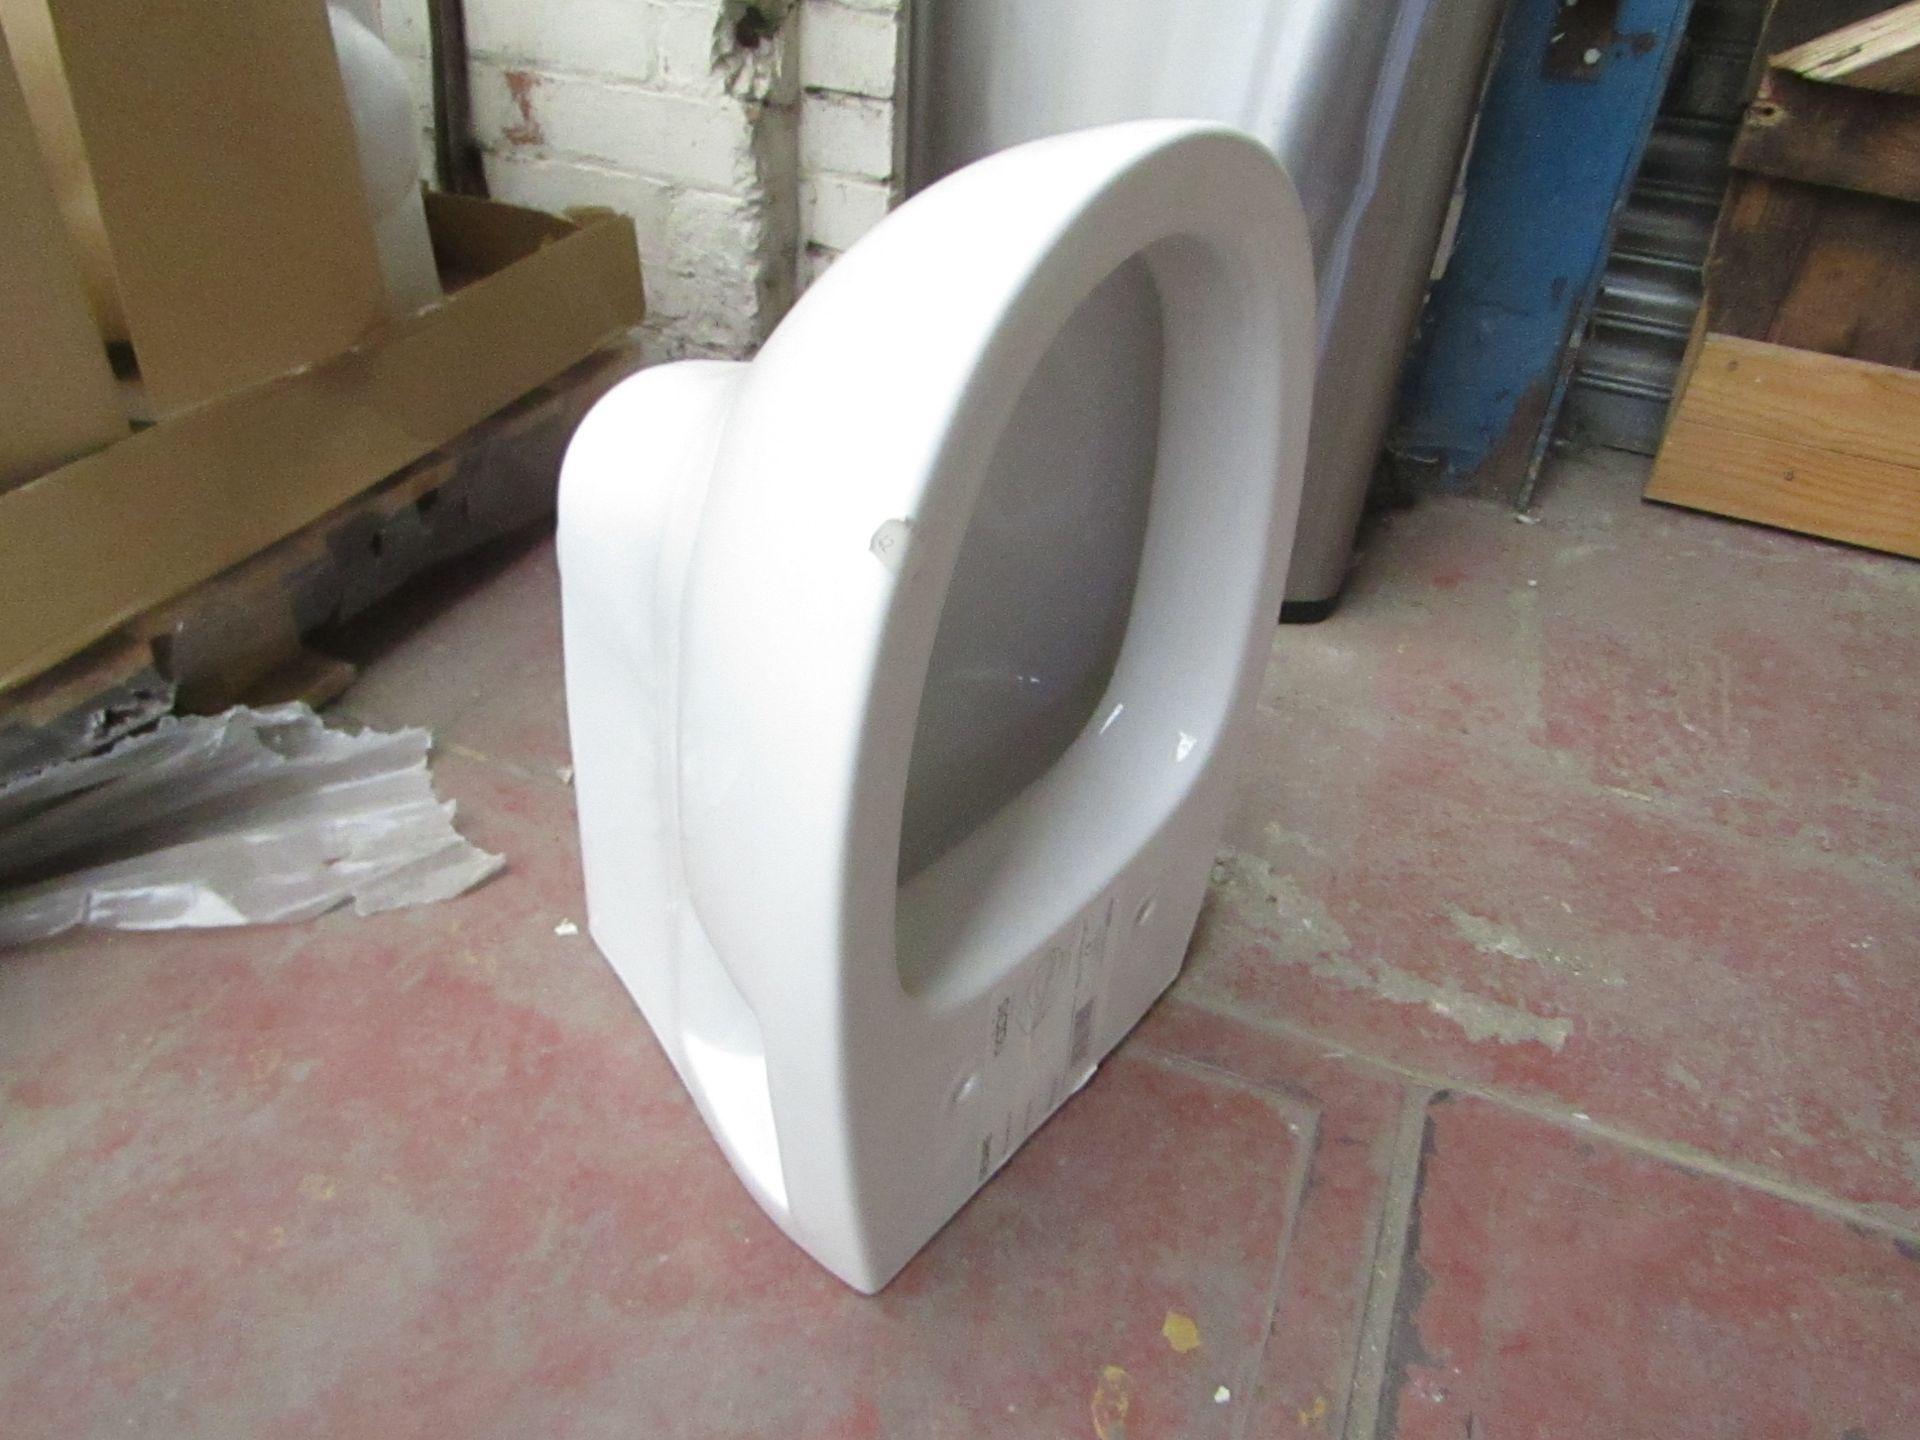 Nabis Desire wall hung toilet pan. new RRP £156